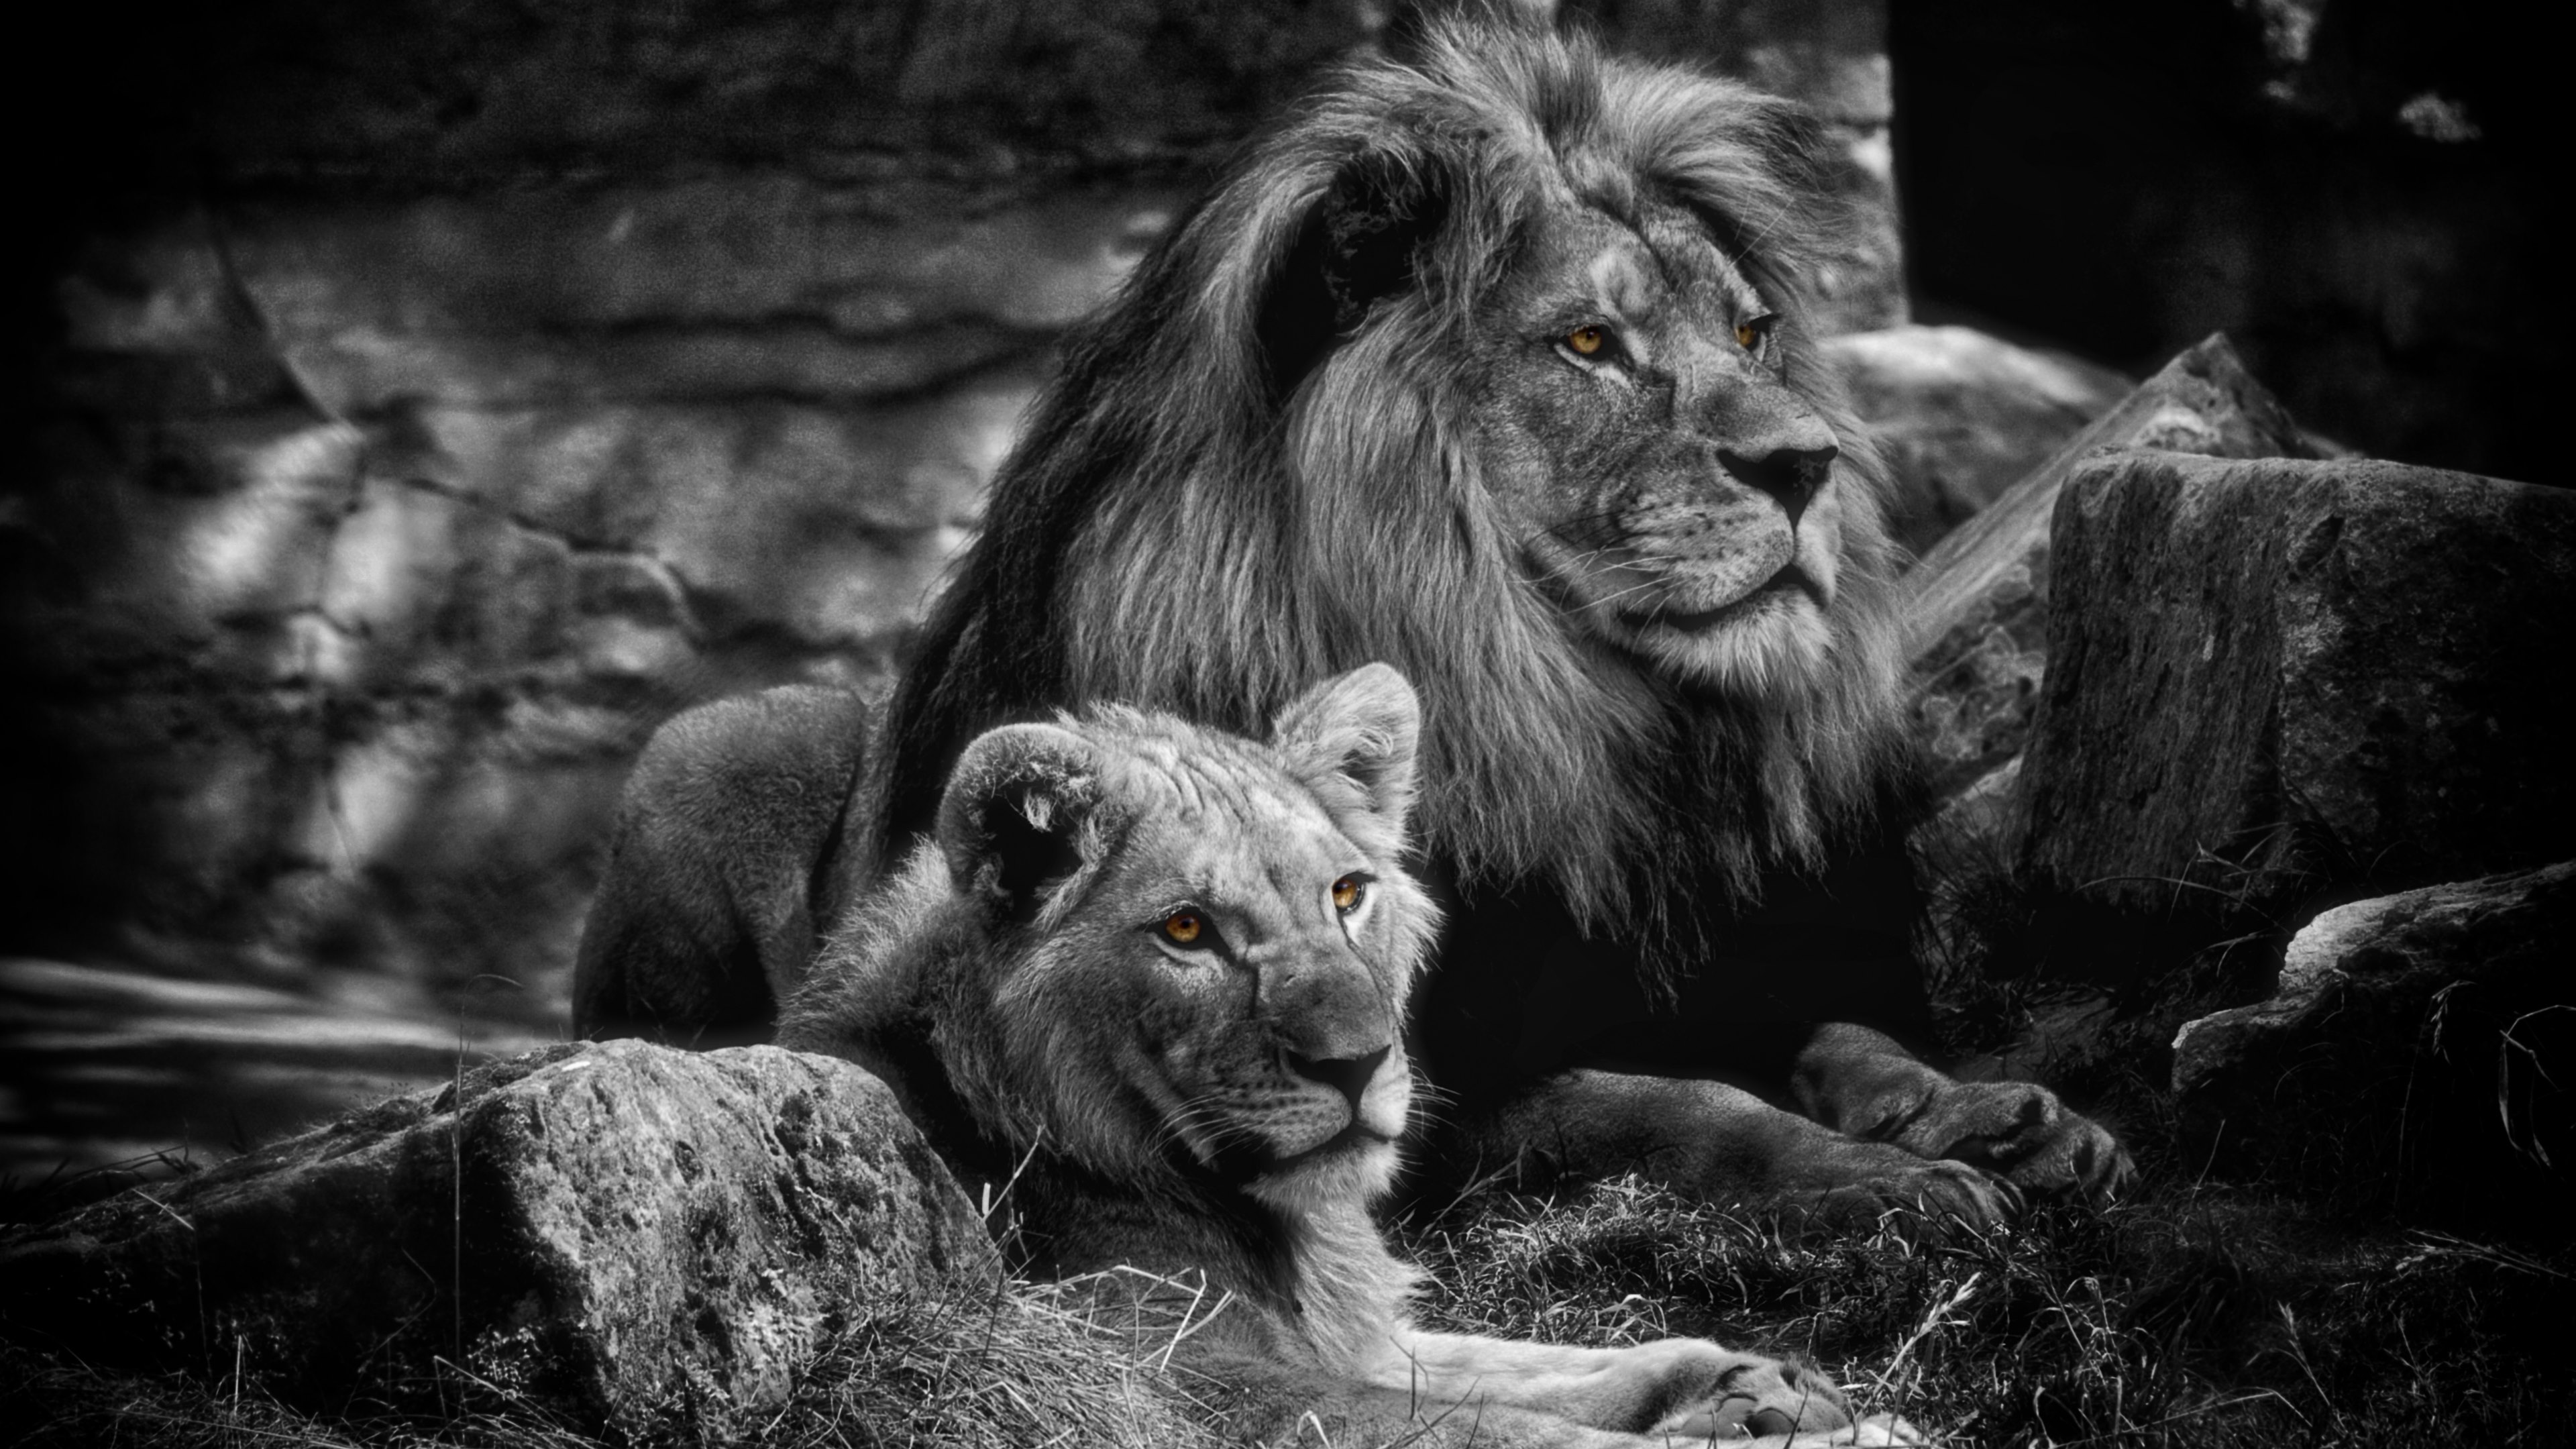 lion wallpapers 4k - best image lion 2018